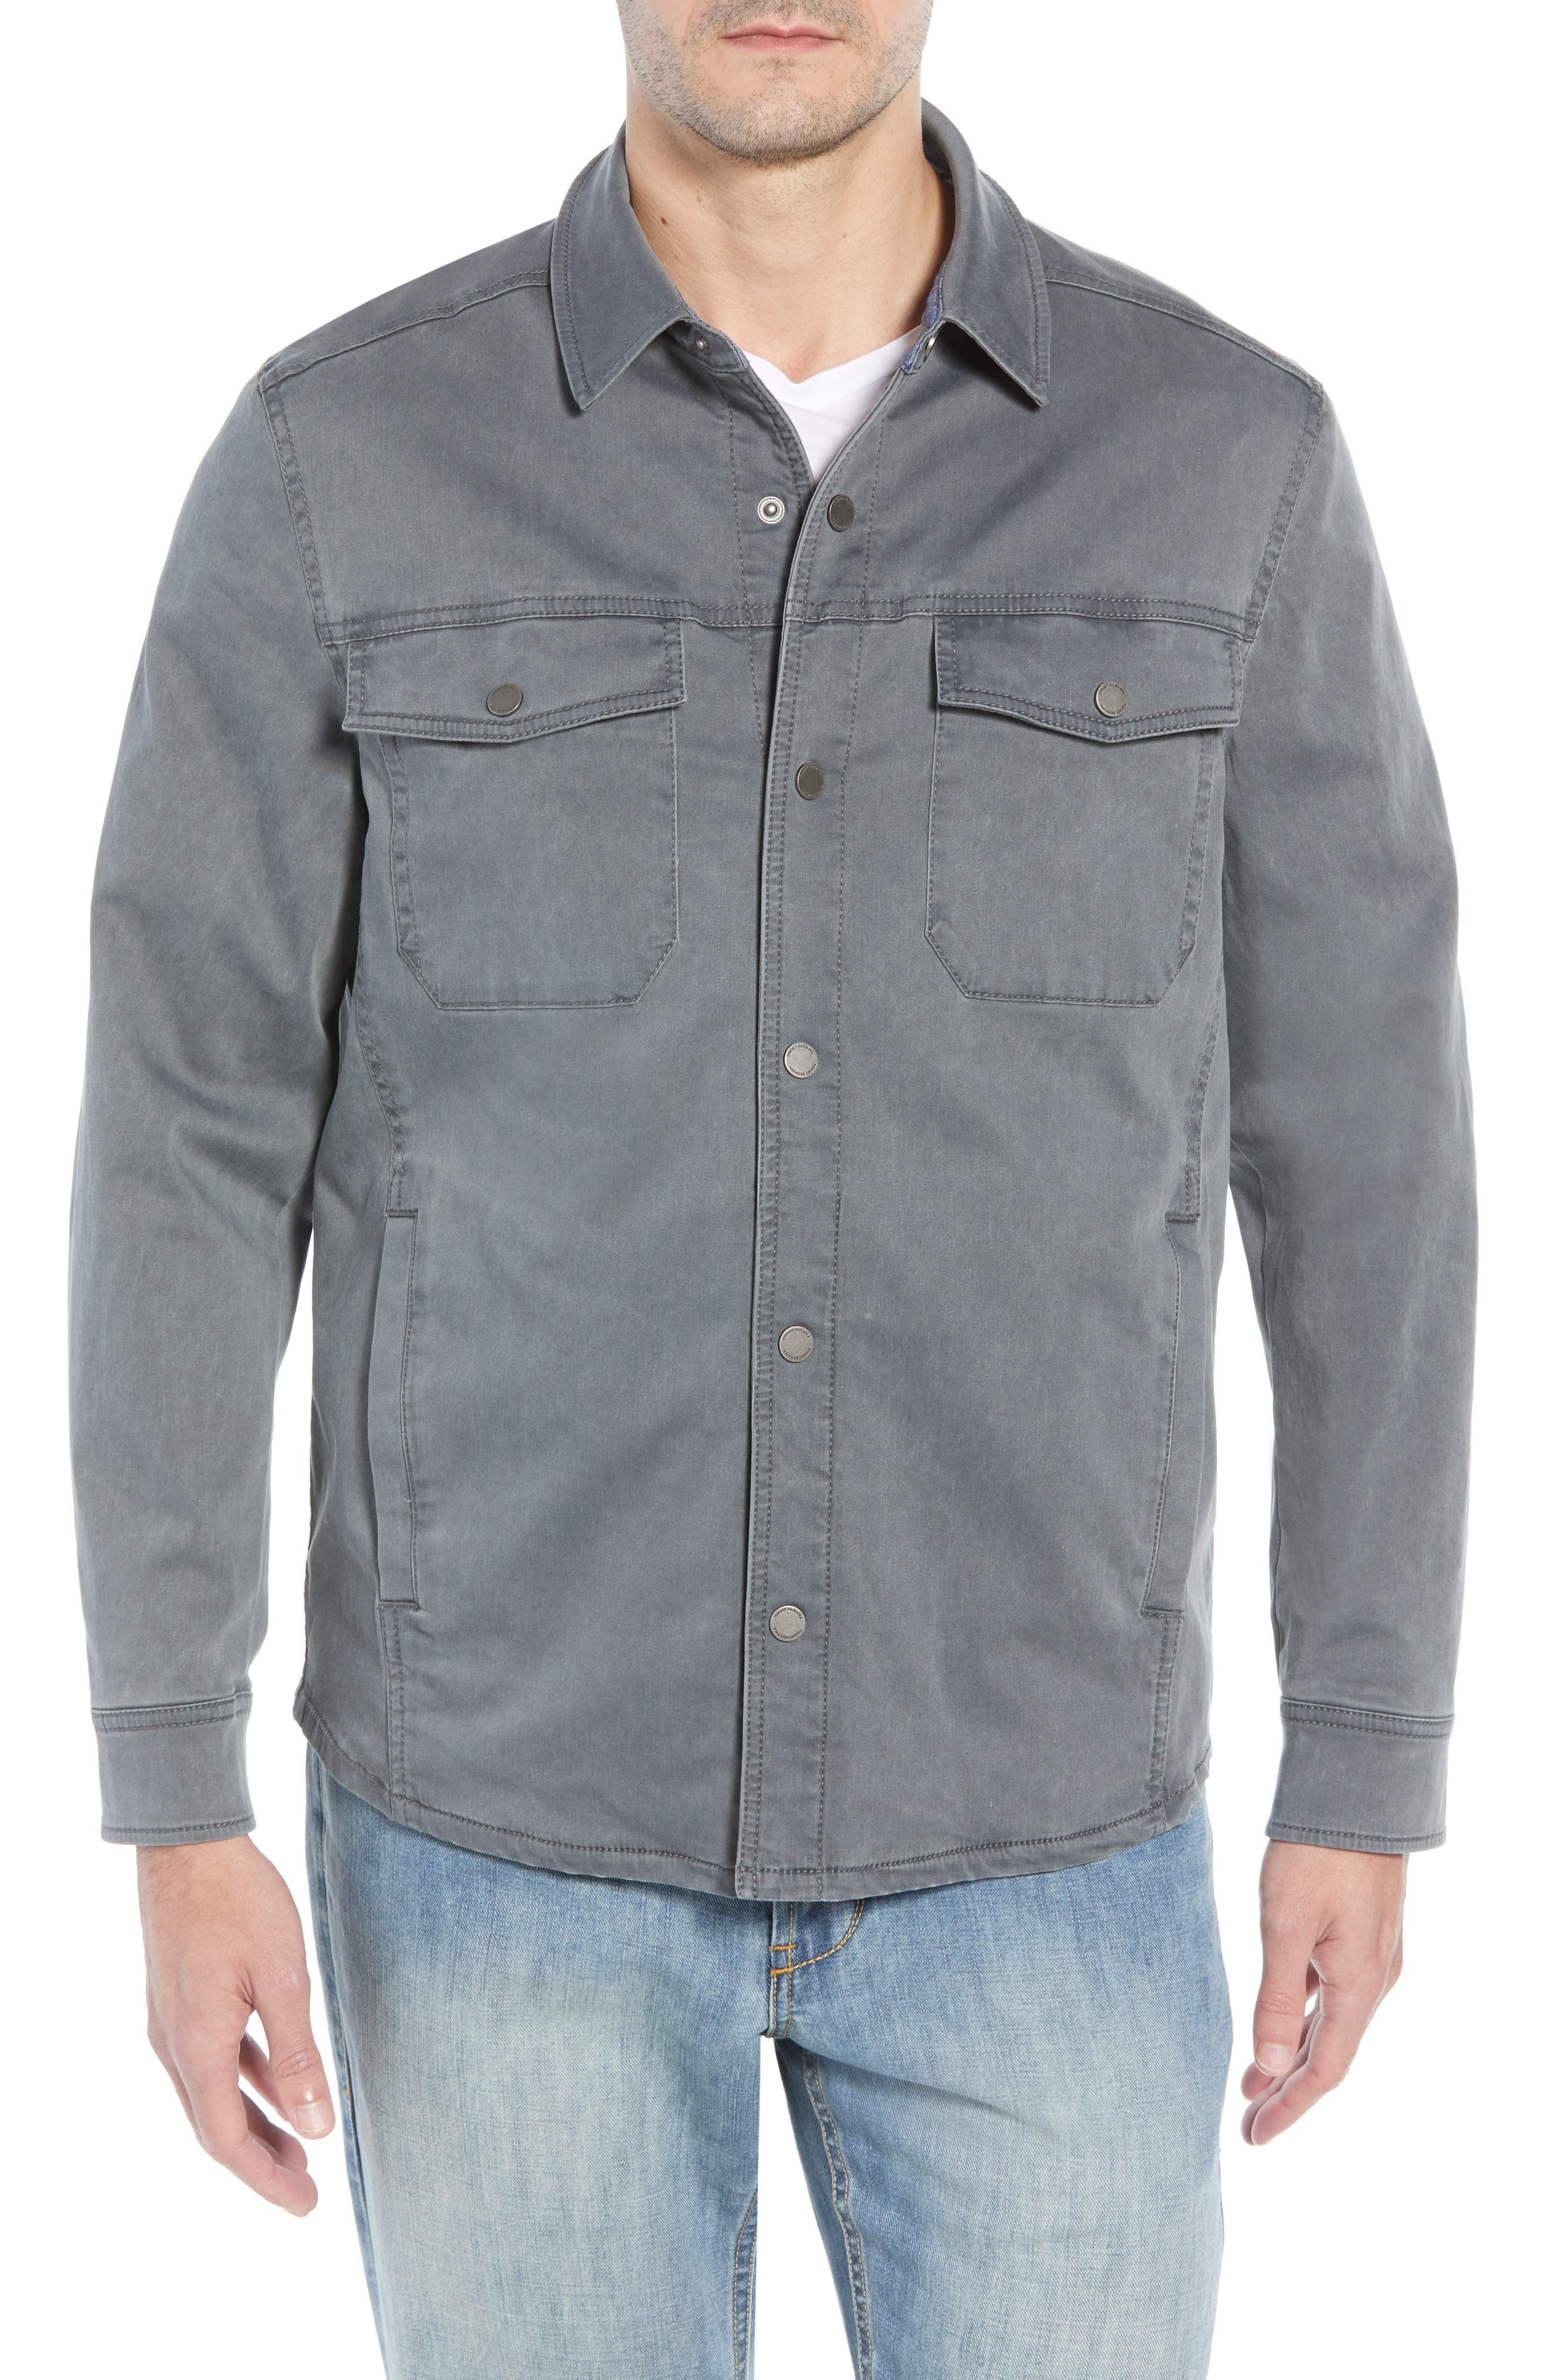 Boracay Regular Fit Shirt Jacket,                             Alternate thumbnail 4, color,                             FOG GREY